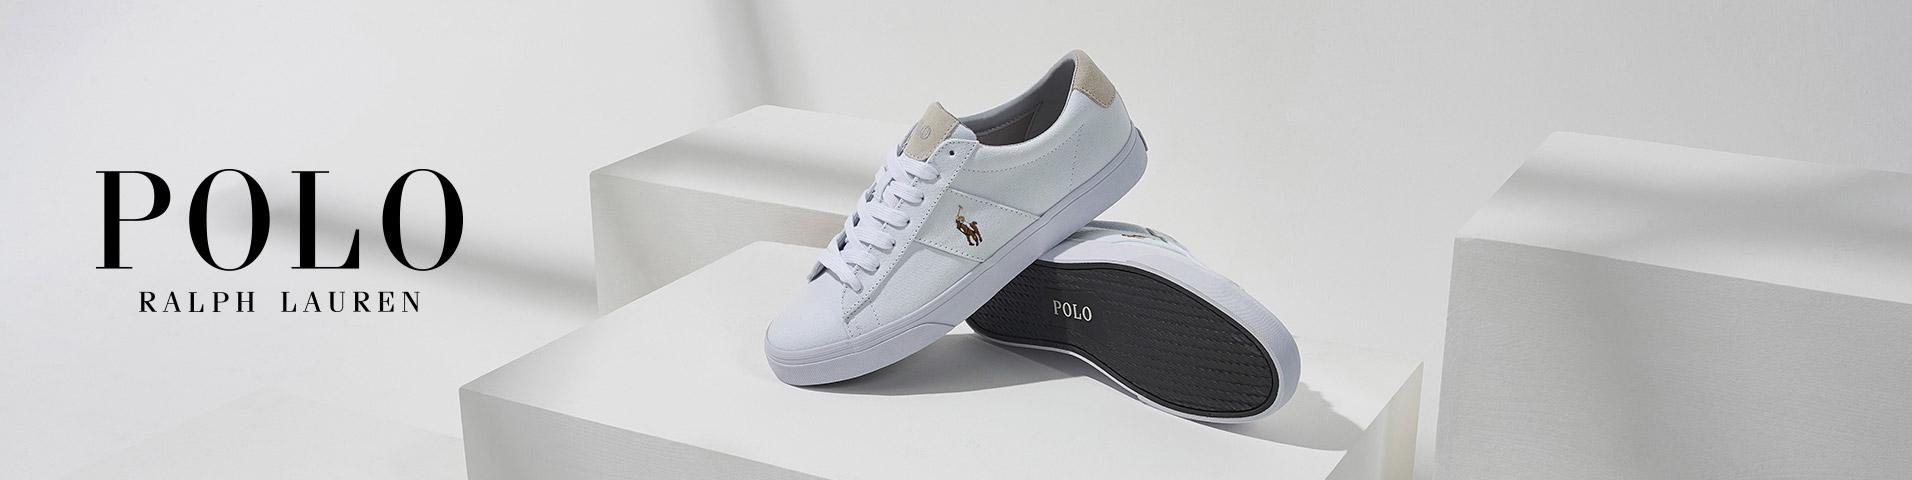 8e65db284a0 Polo Ralph Lauren Sneakers | Herrer | De nyeste kollektioner online ...